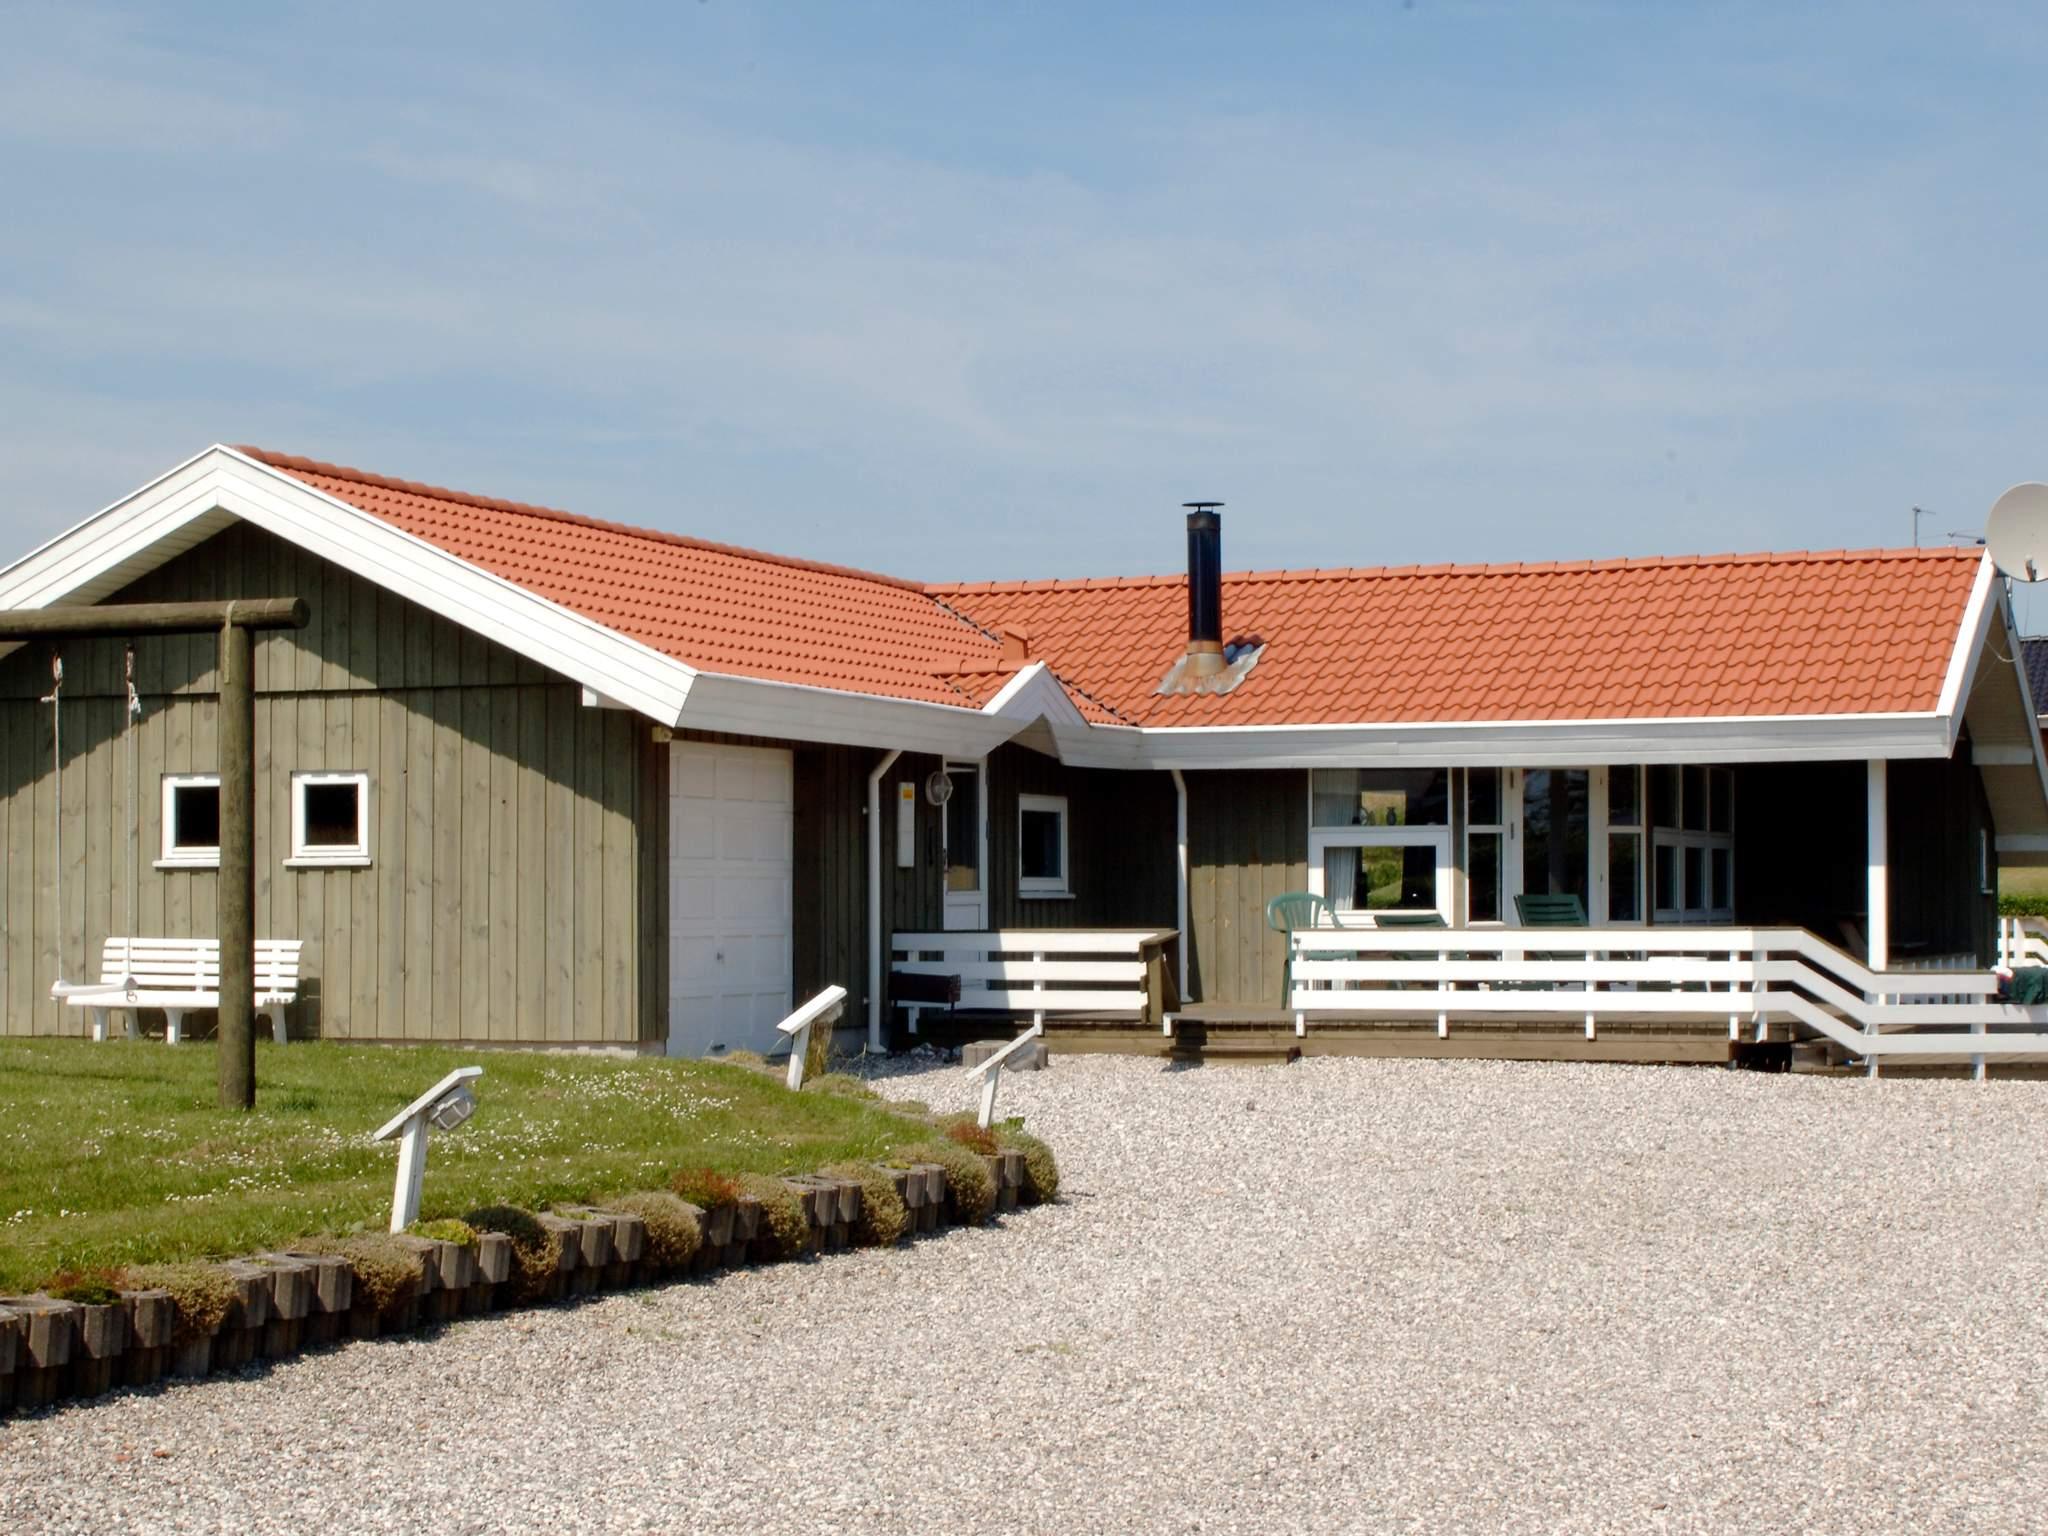 Ferienhaus Mørkholt (125852), Mørkholt, , Ostjütland, Dänemark, Bild 14